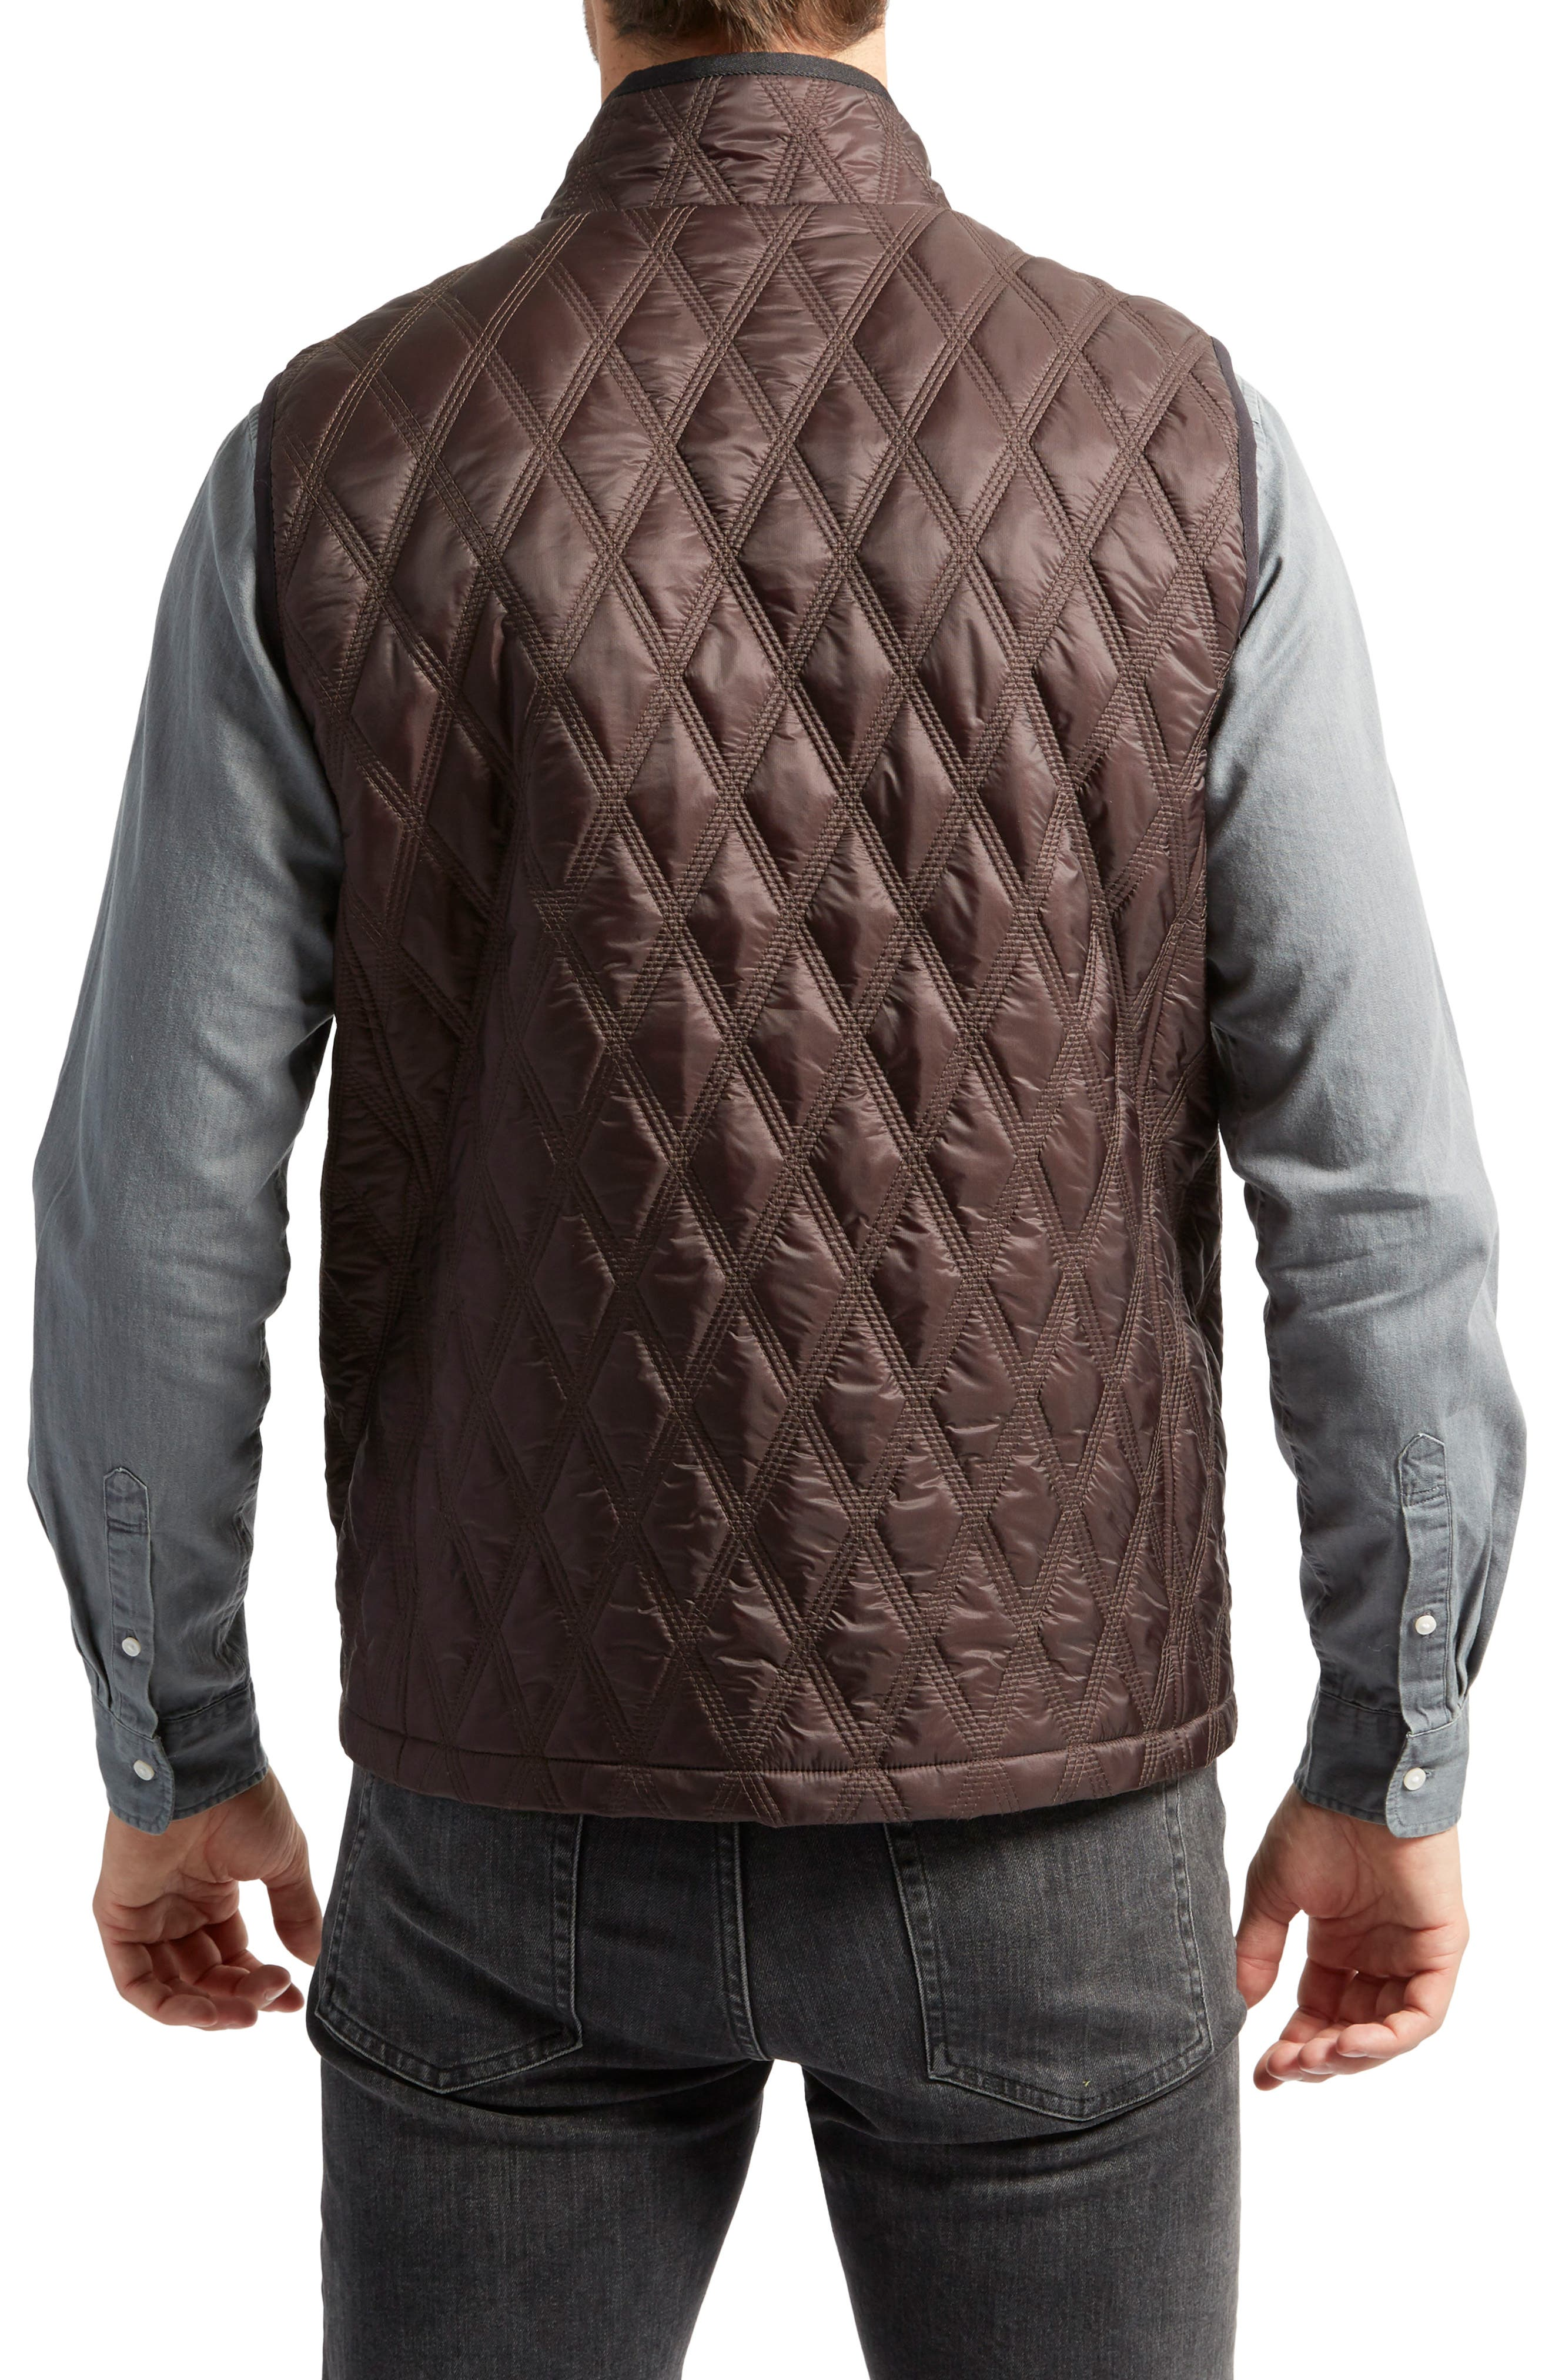 Huntsville Triple Stitch Quilted Heat System Vest,                             Alternate thumbnail 2, color,                             238